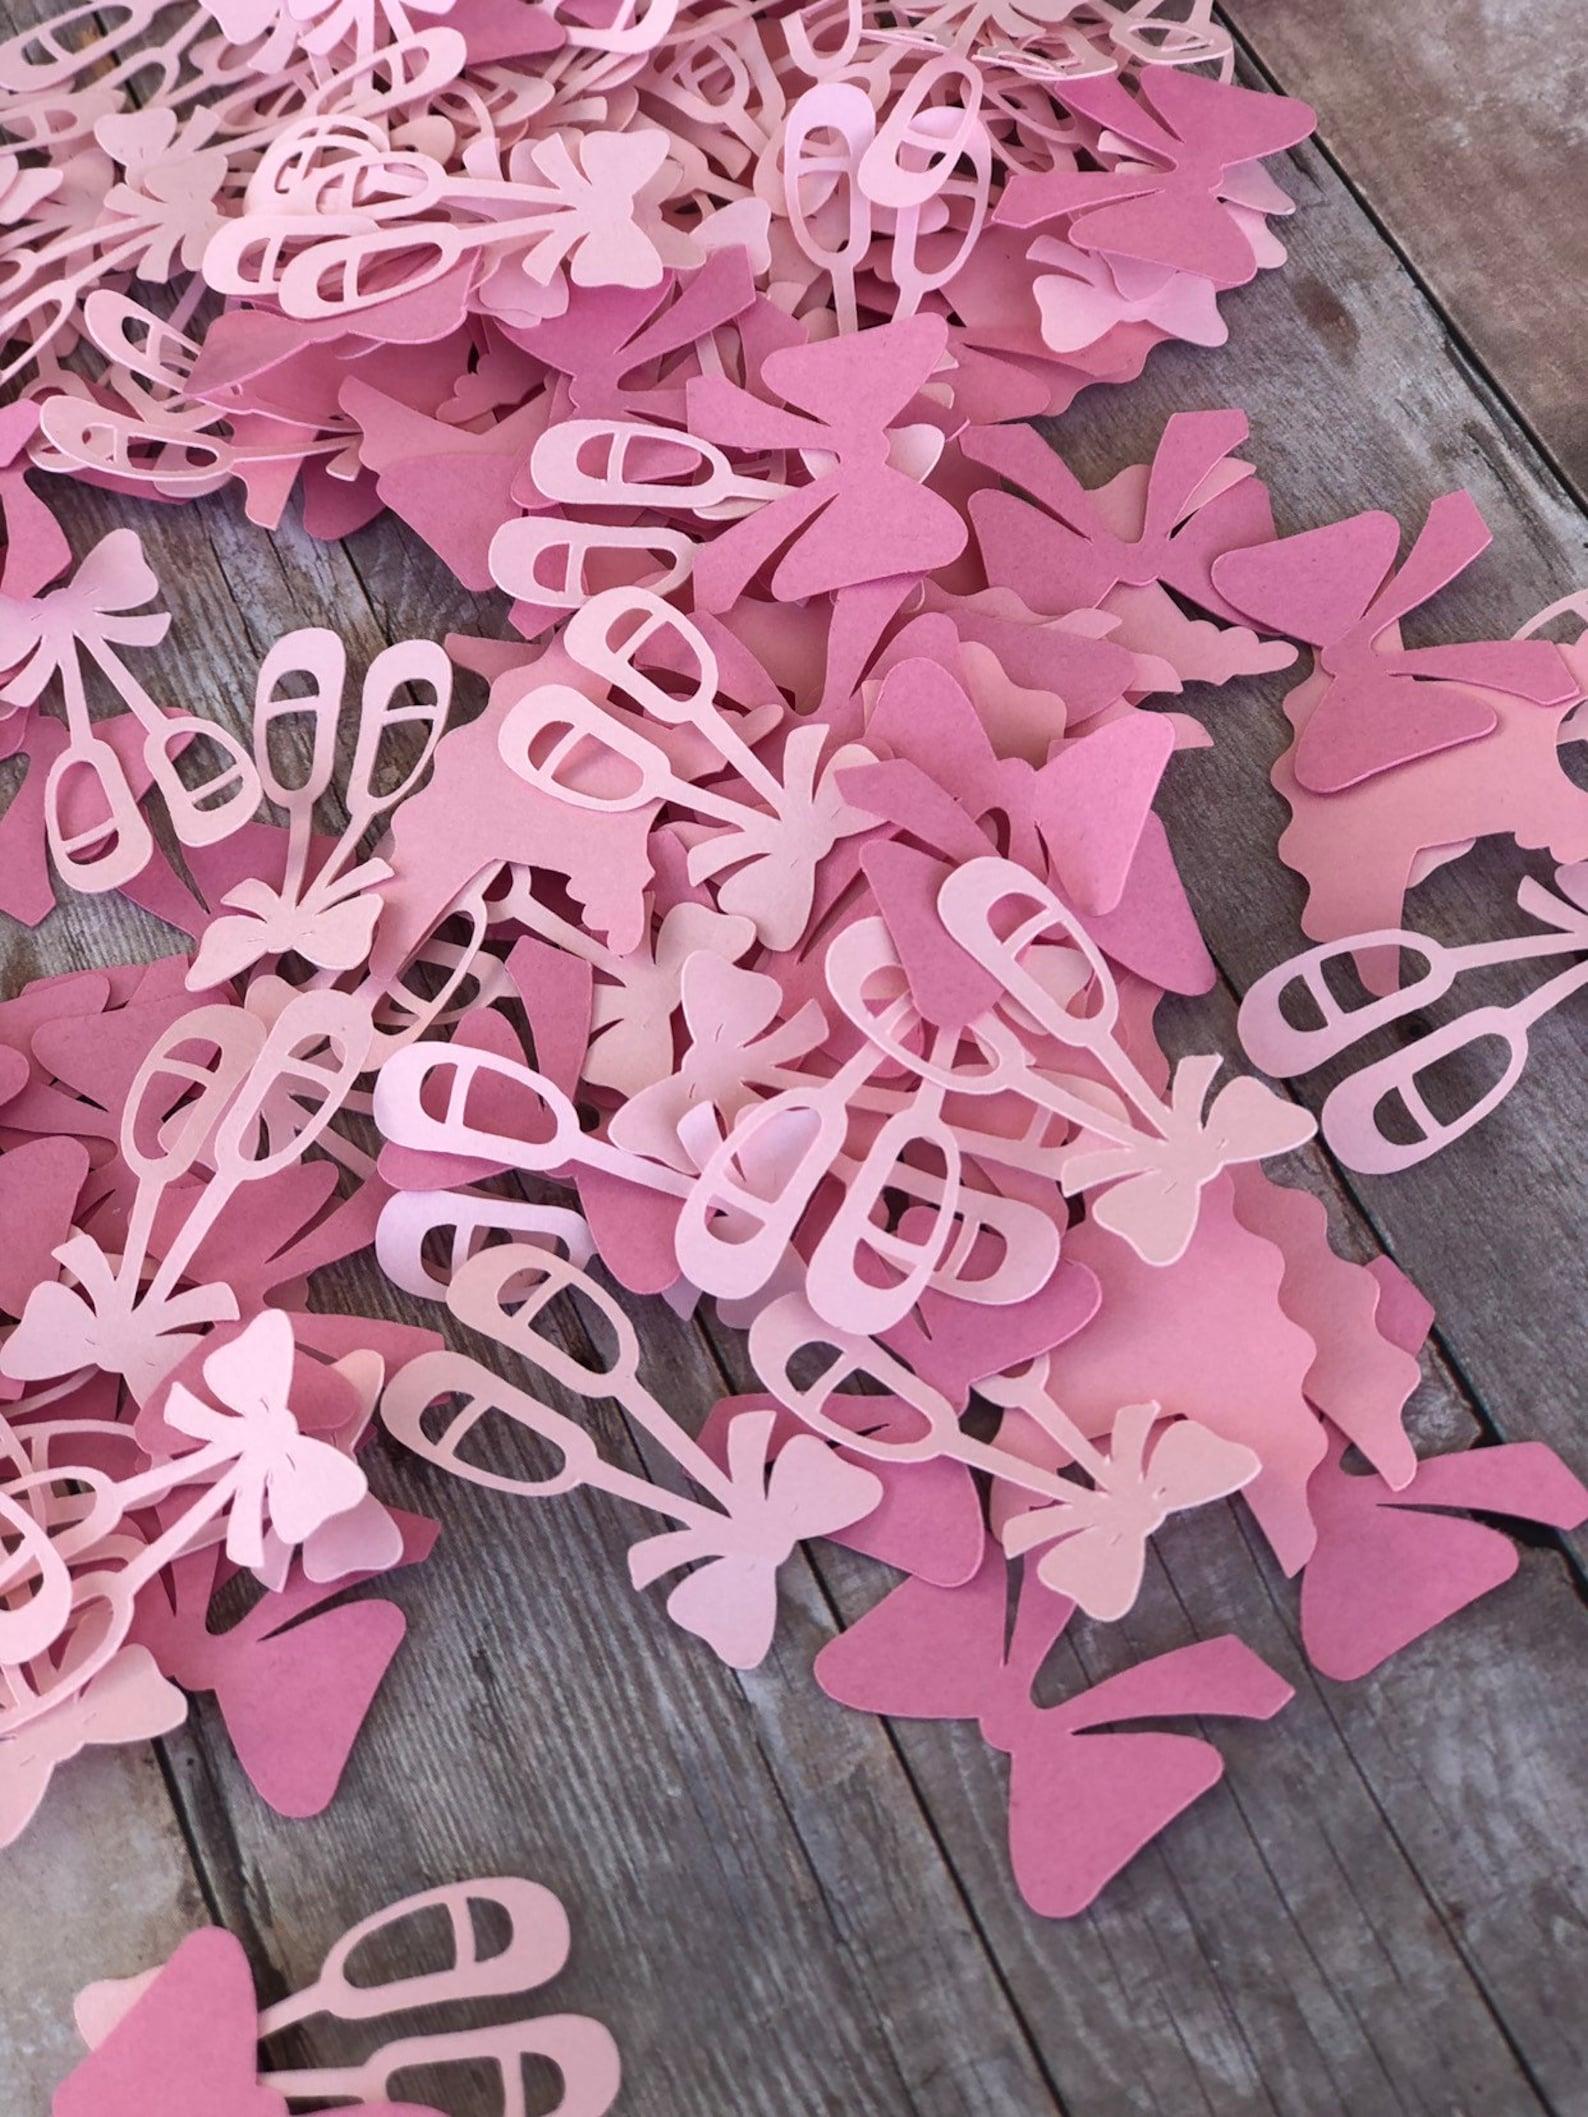 tutus confetti; ballerina confetti; ballerina birthday party; dance party; ballerina table decor; pink tutu; ballet shoe confett